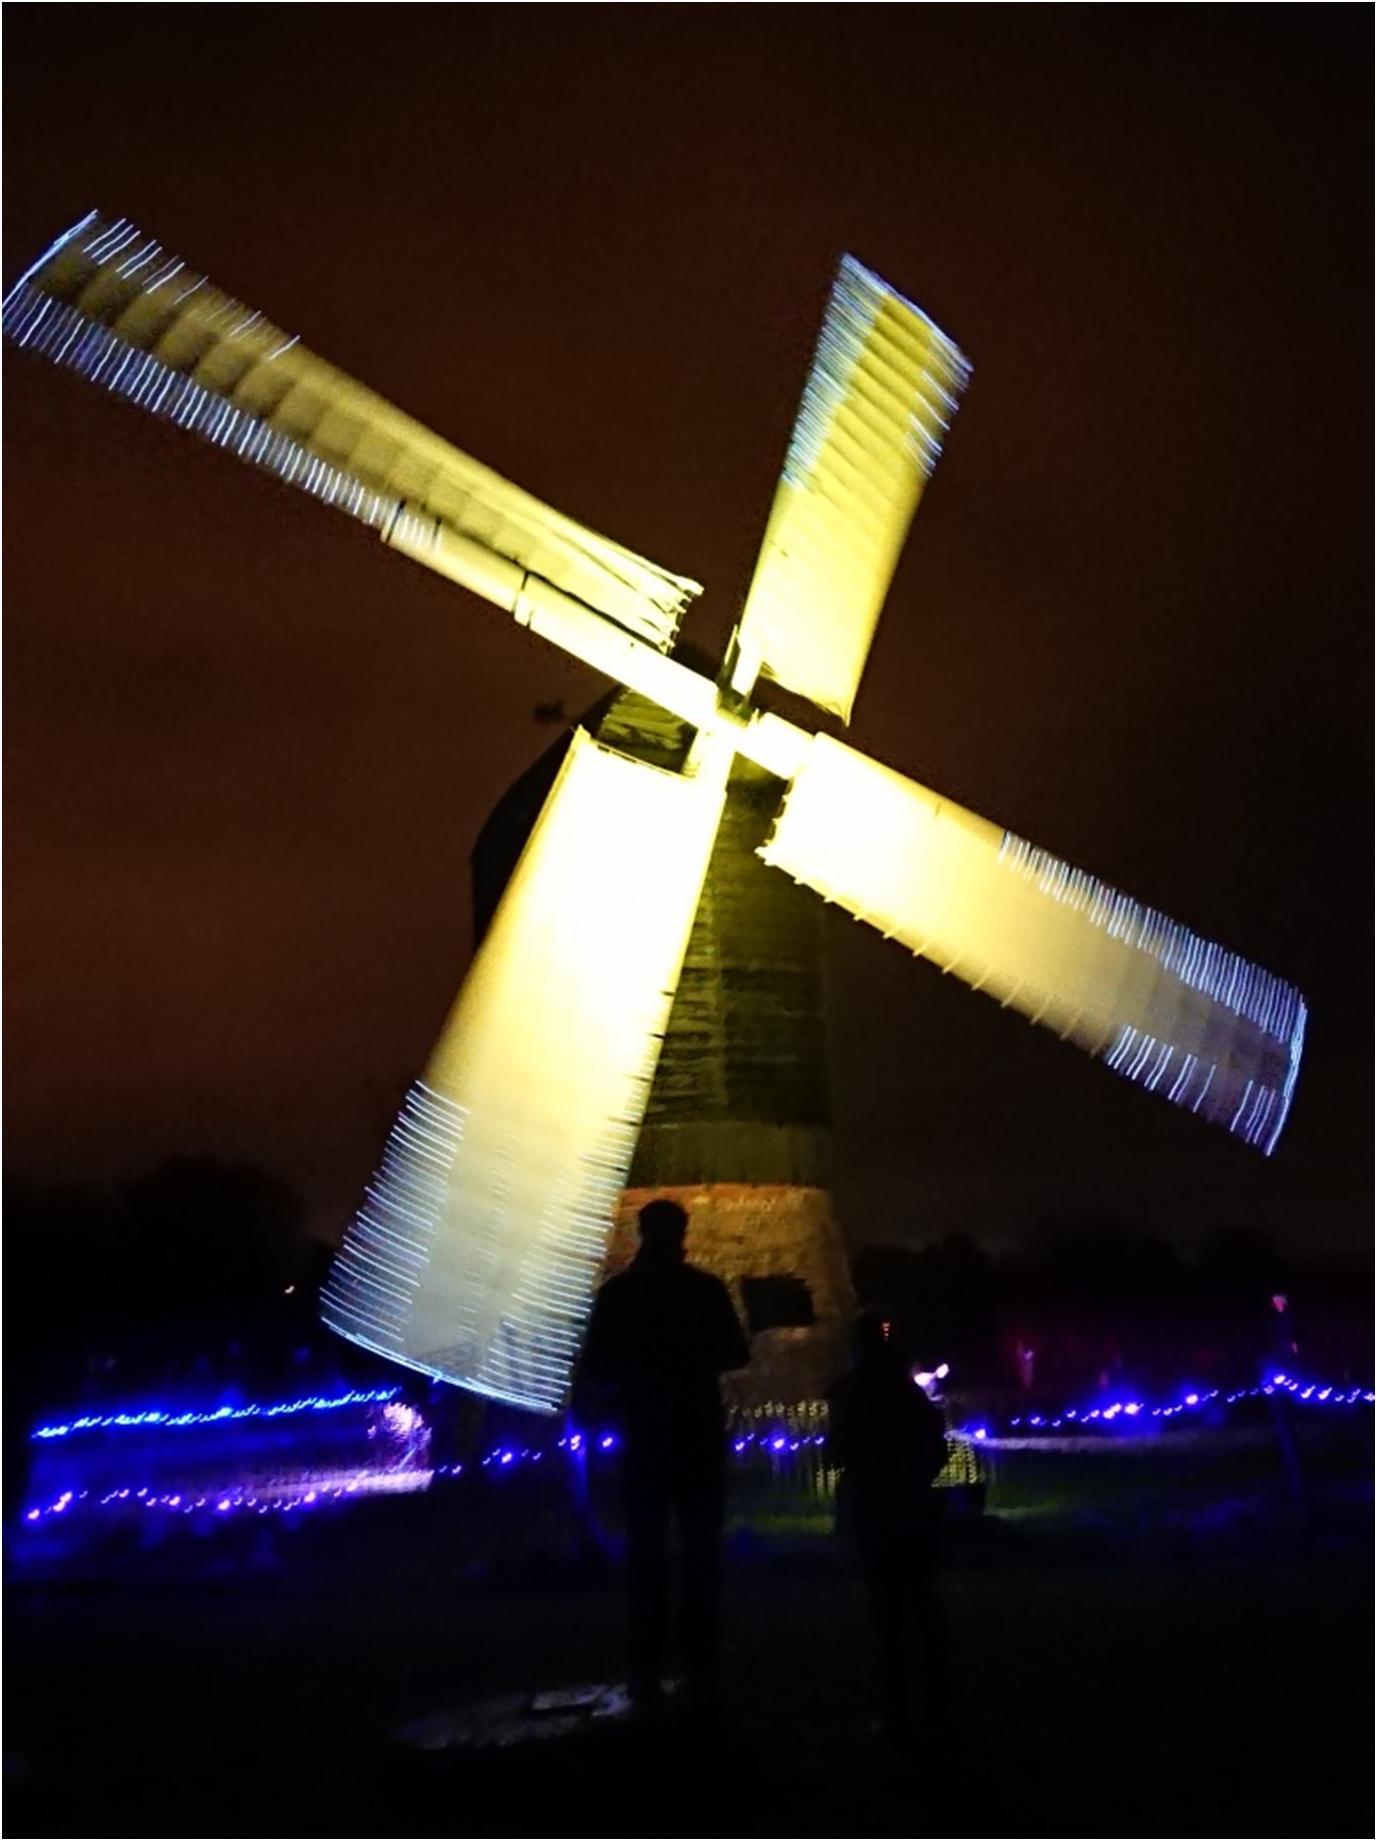 Avoncroft's historic windmill restored to sailing glory